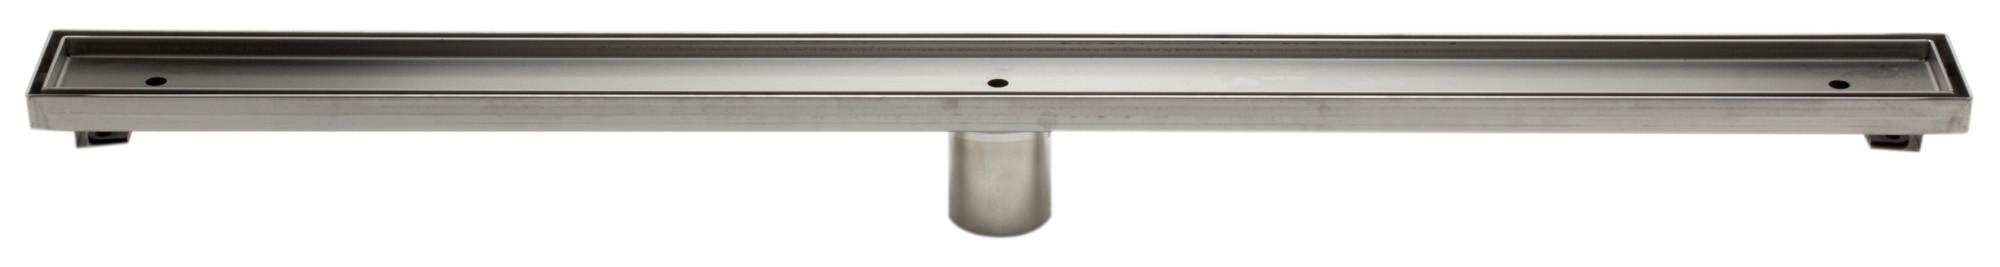 "ALFI brand ABLD36A 36"" Modern Stainless Steel Linear Shower Drain  w/o Cover"